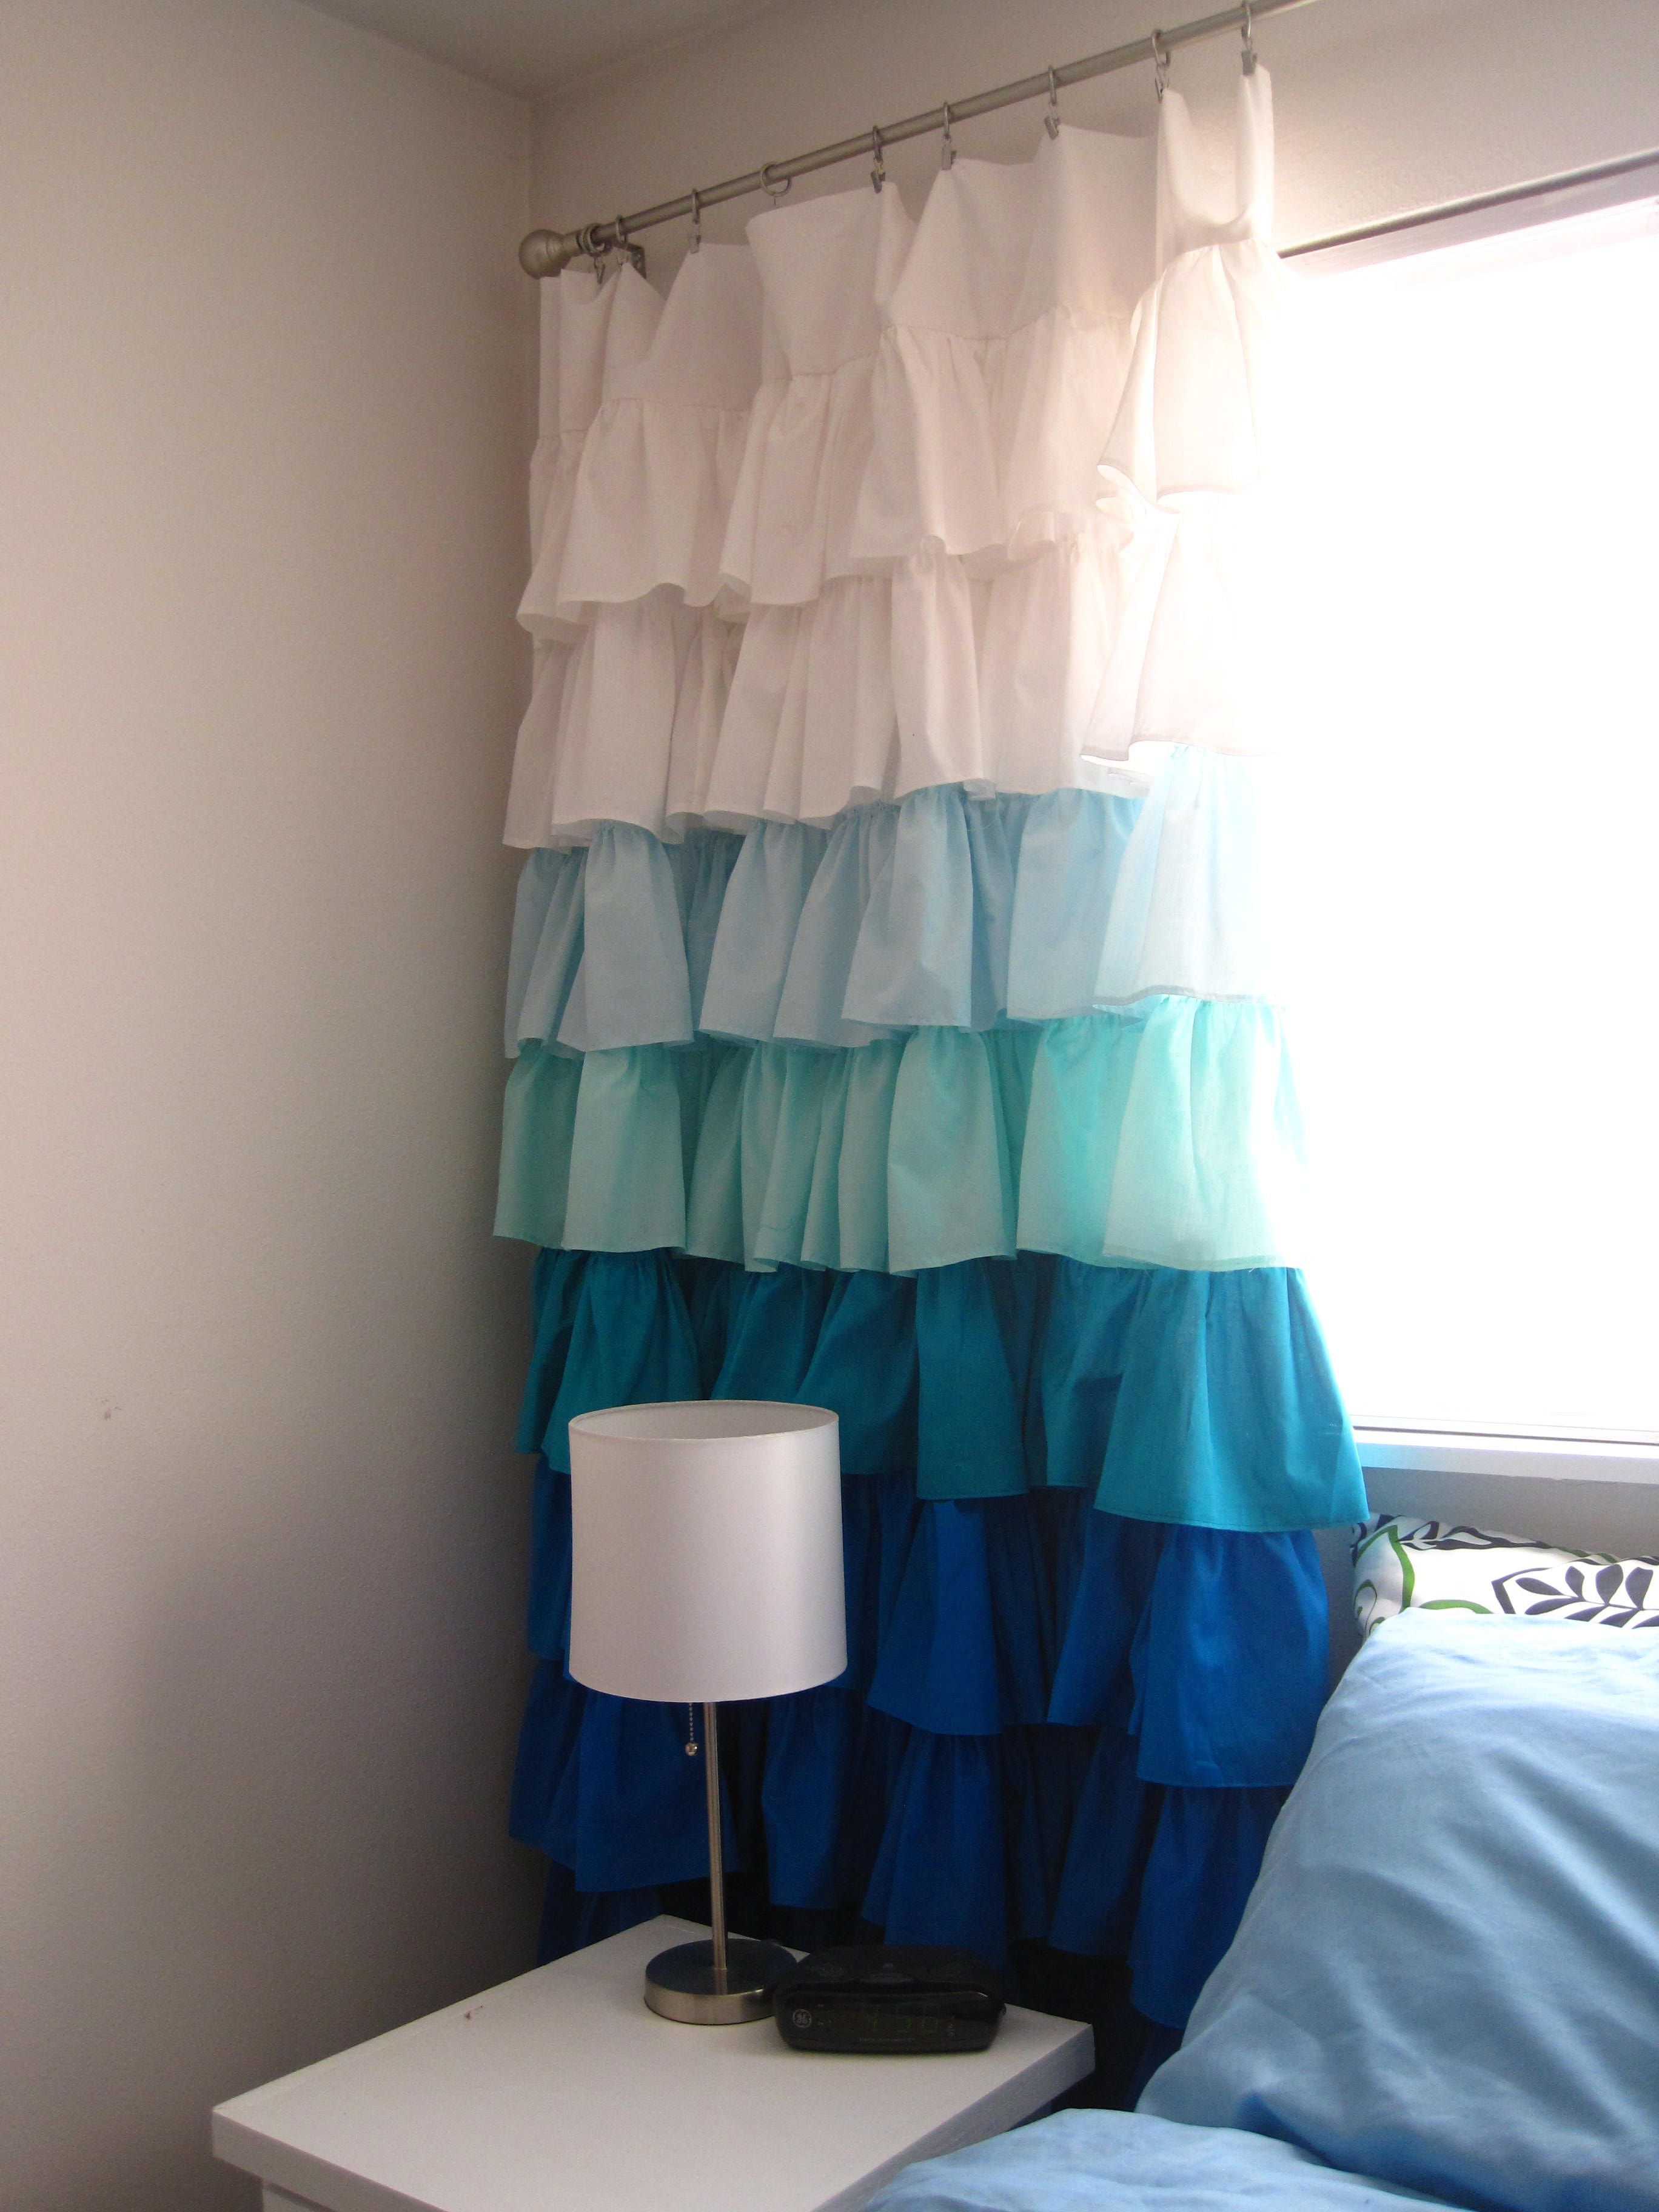 Ombre ruffle curtain - Diy Ruffle Curtains